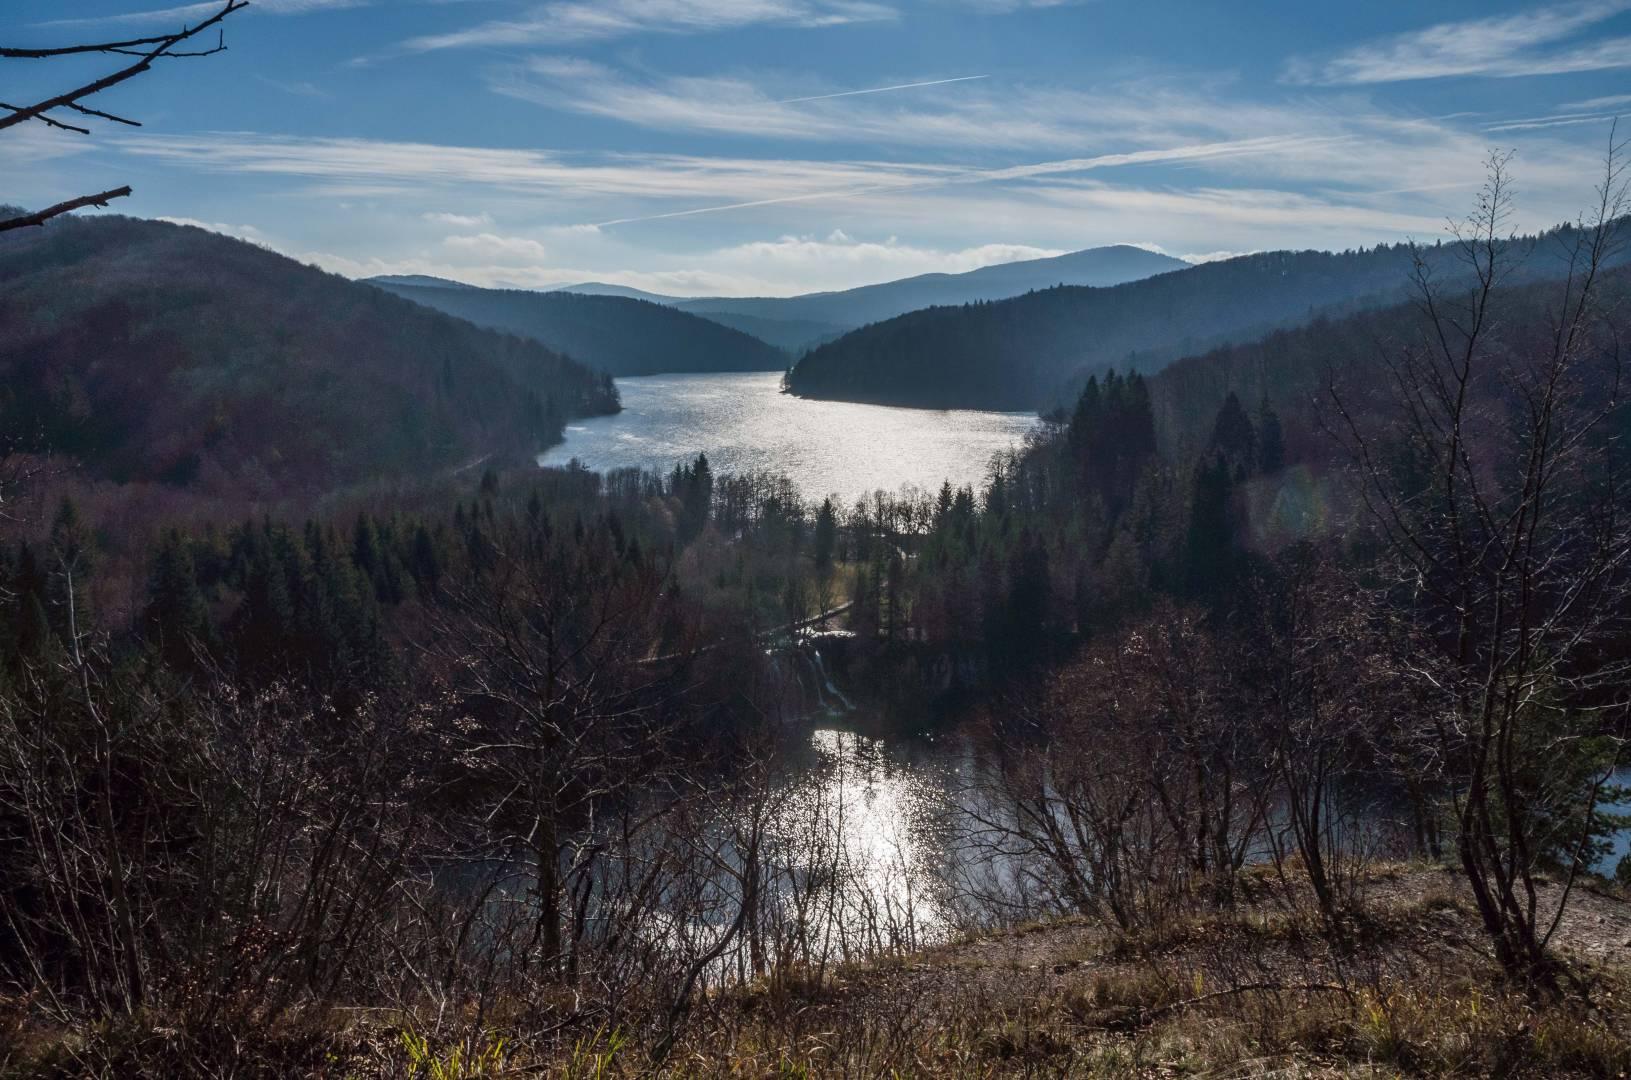 Prošćansko and Ciginovac lakes